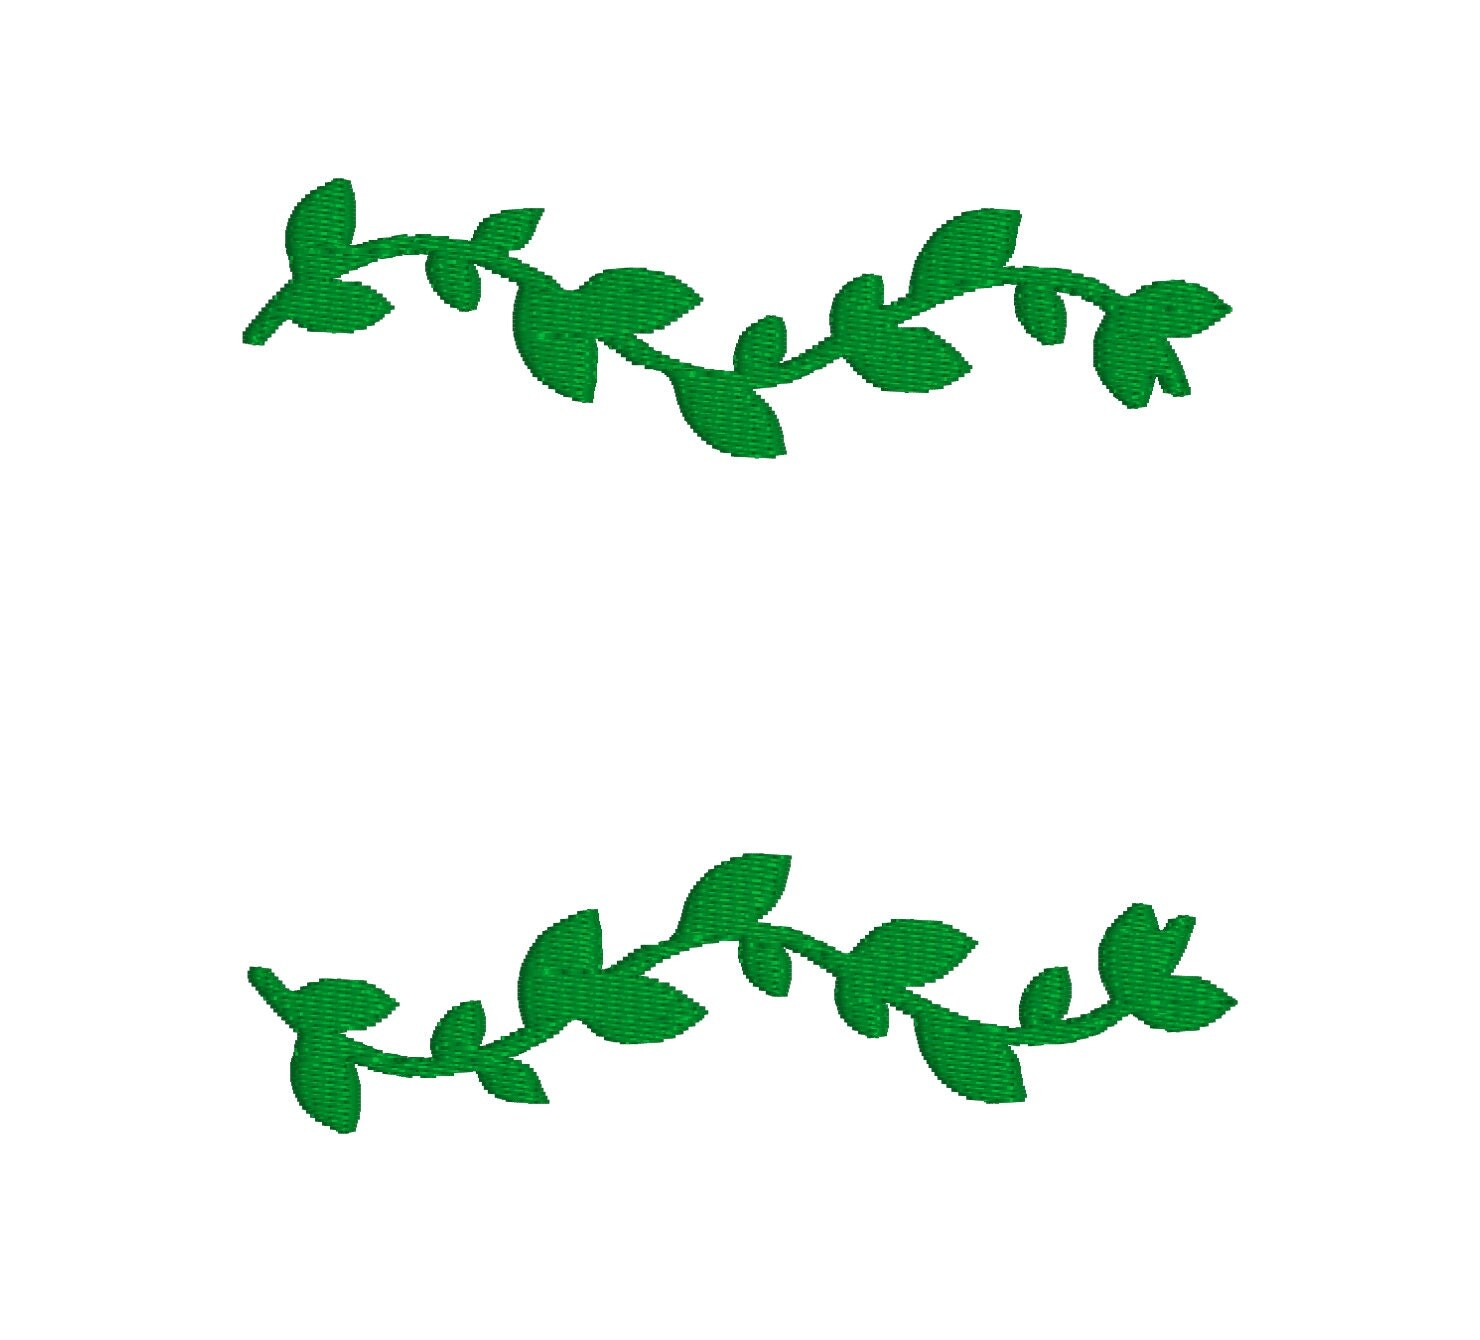 Buy 2, Get 1 Free  Green Vine Border, Flourish, Line, Leaves Machine  Embroidery Design In 3 Sizes  4x4, 5x7, 6x10